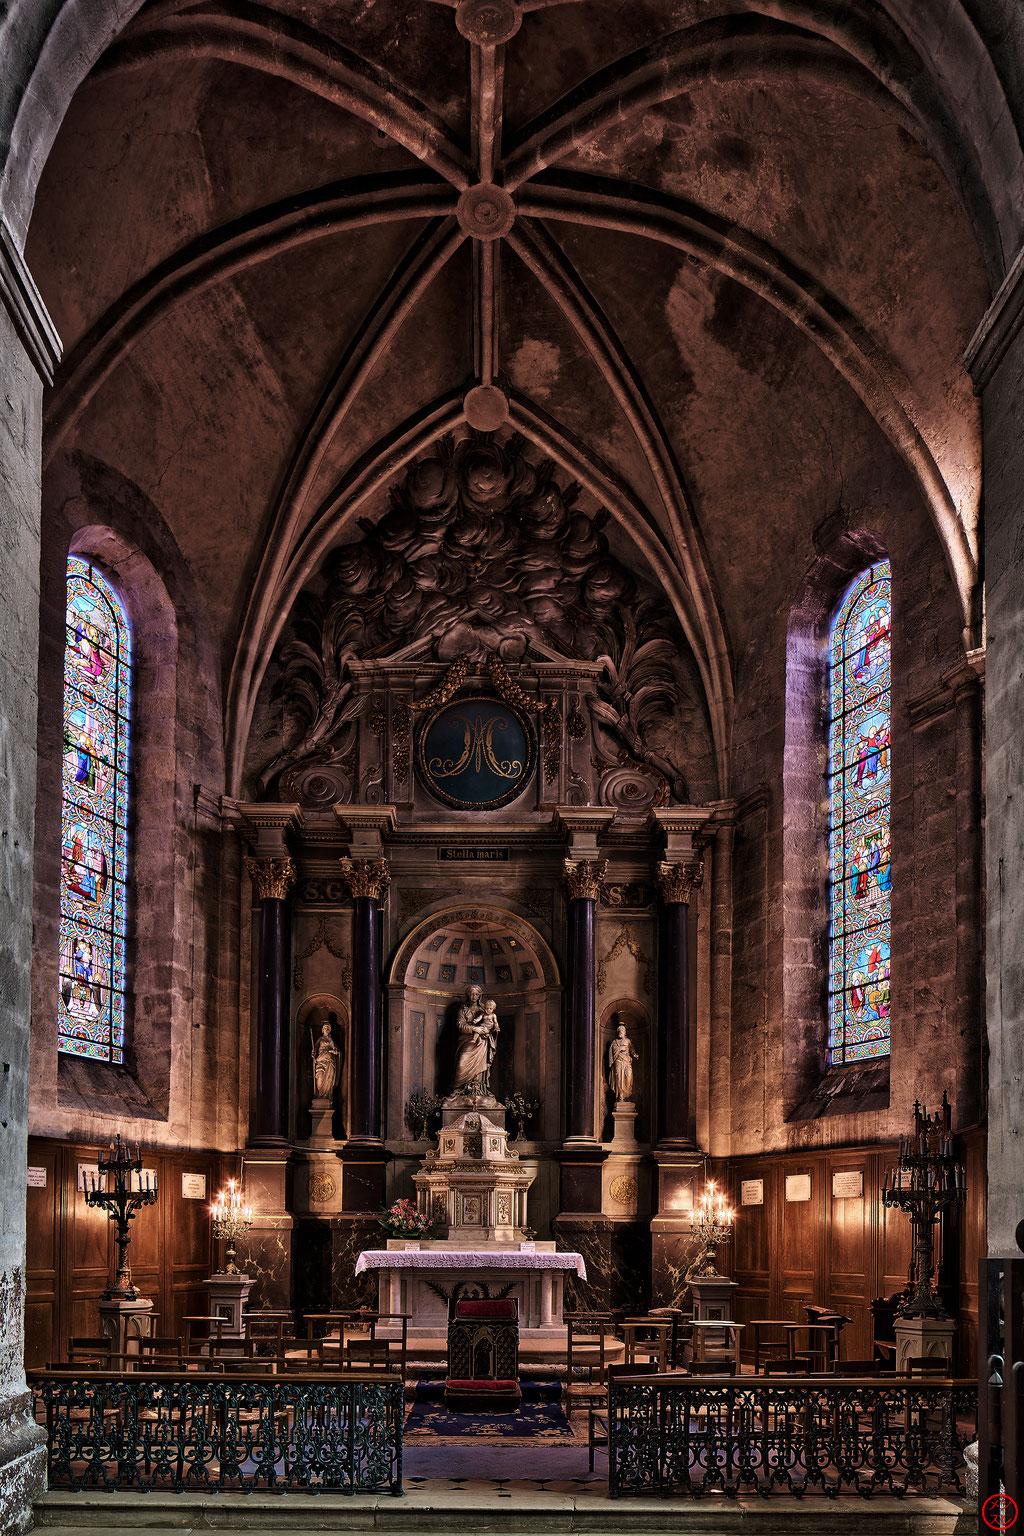 Eglise Saint-Germain-l'Auxerrois, Dourdan, Juin 2018